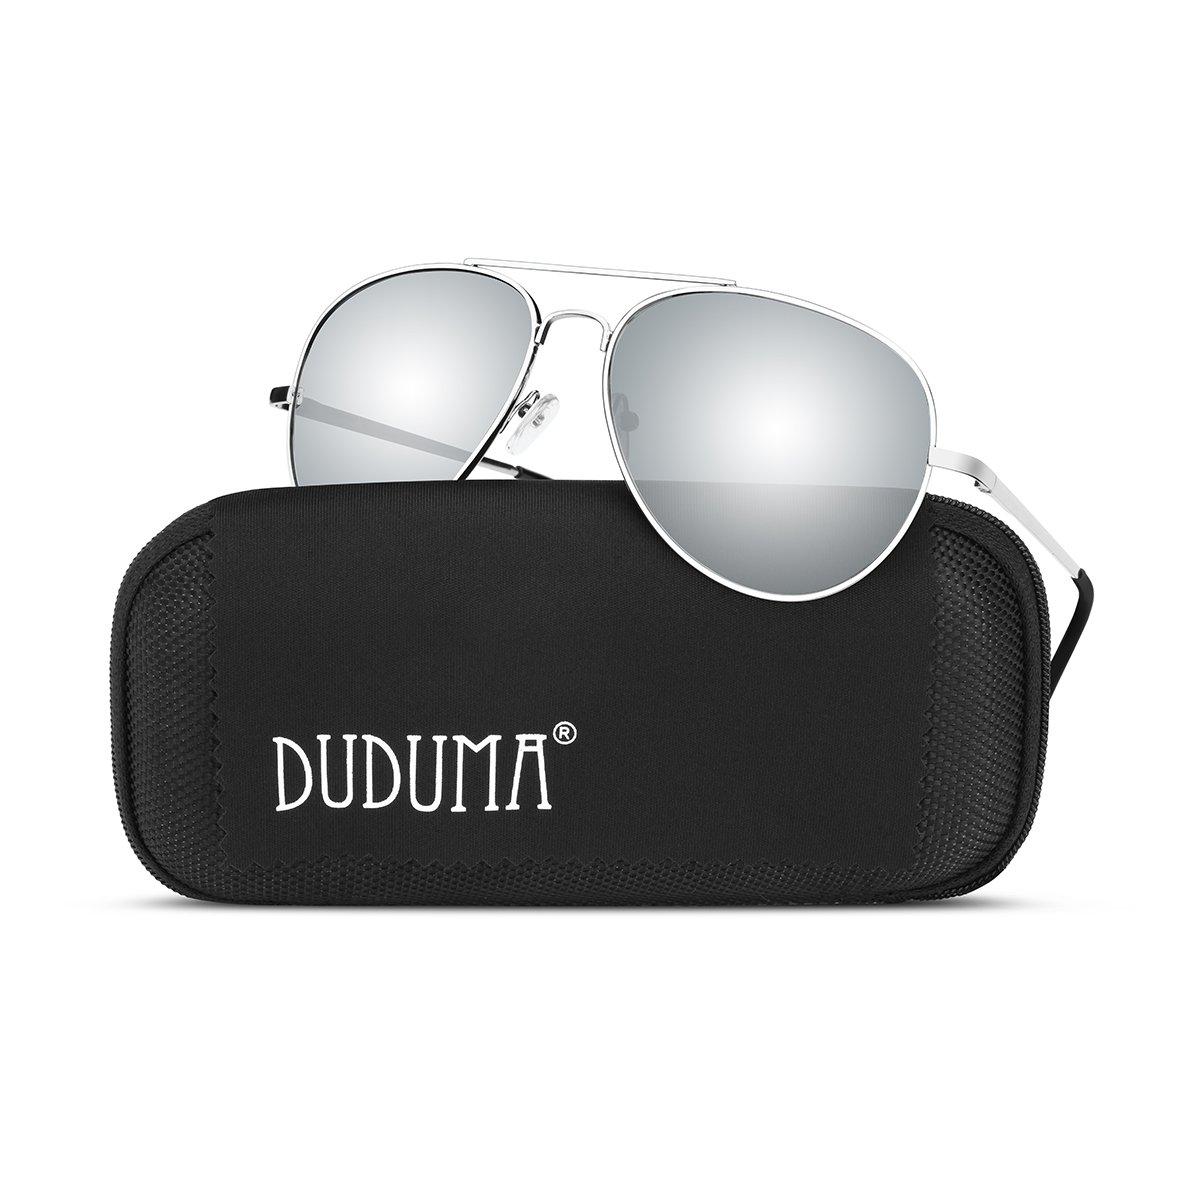 Duduma Premium Full Mirrored Aviator Sunglasses w/Flash Mirror Lens Uv400(Silver frame/Silver mirror lens) by Duduma